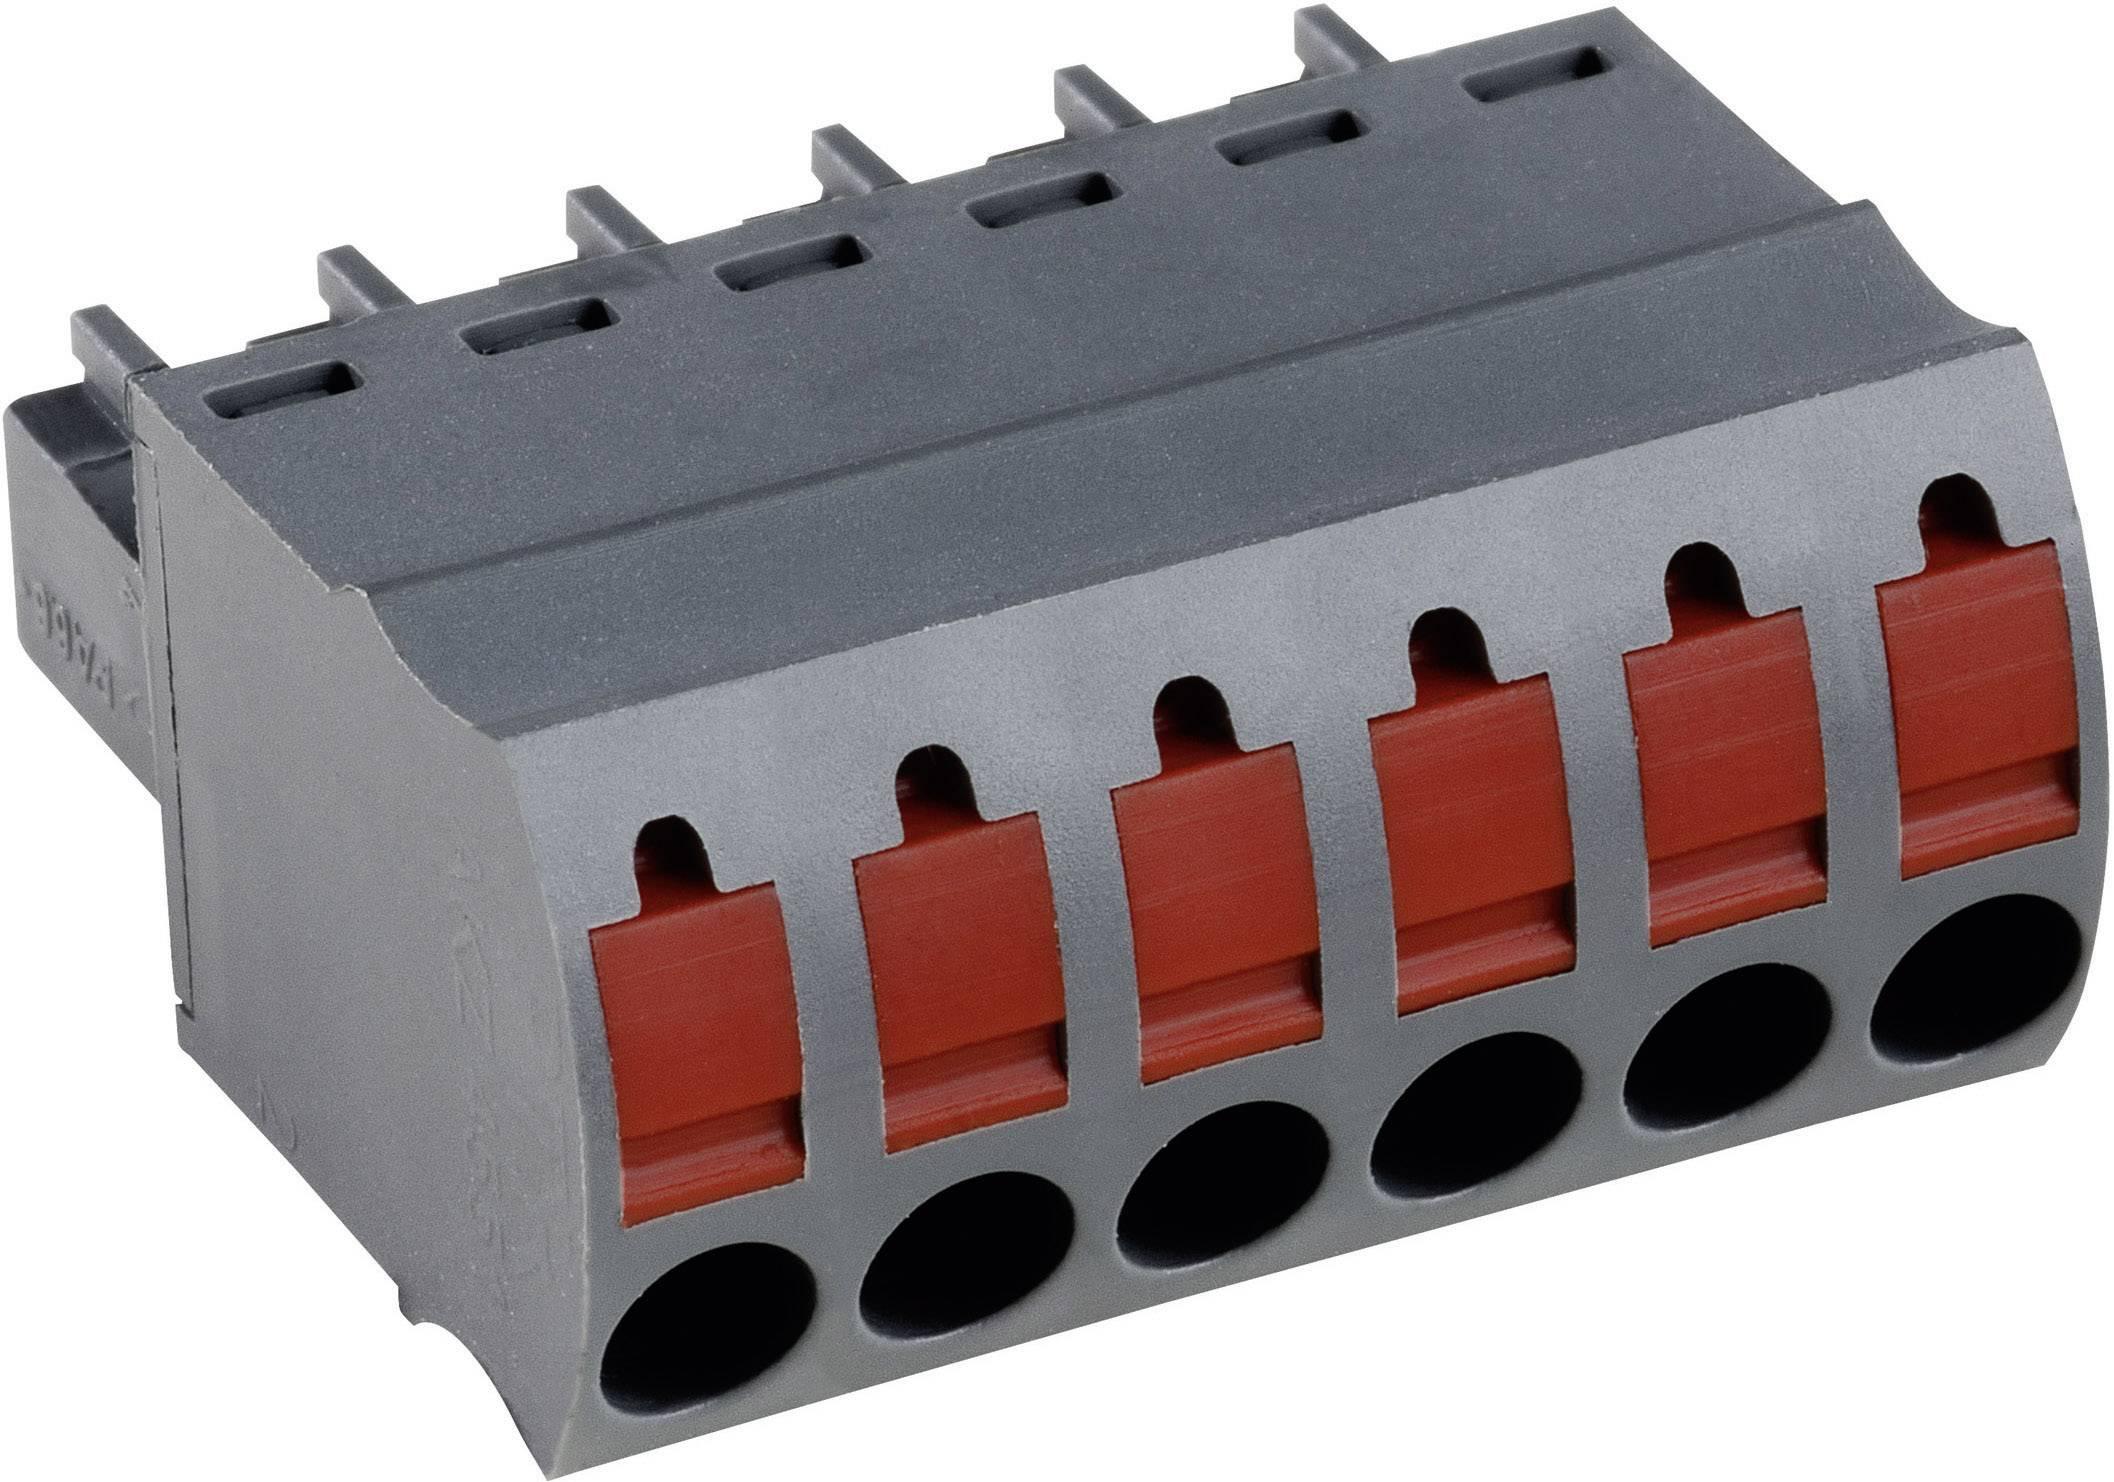 Zásuvkové púzdro na kábel PTR AKZ4551/4KD-3.81 54551040421F, 21.10 mm, pólů 4, rozteč 3.81 mm, 1 ks